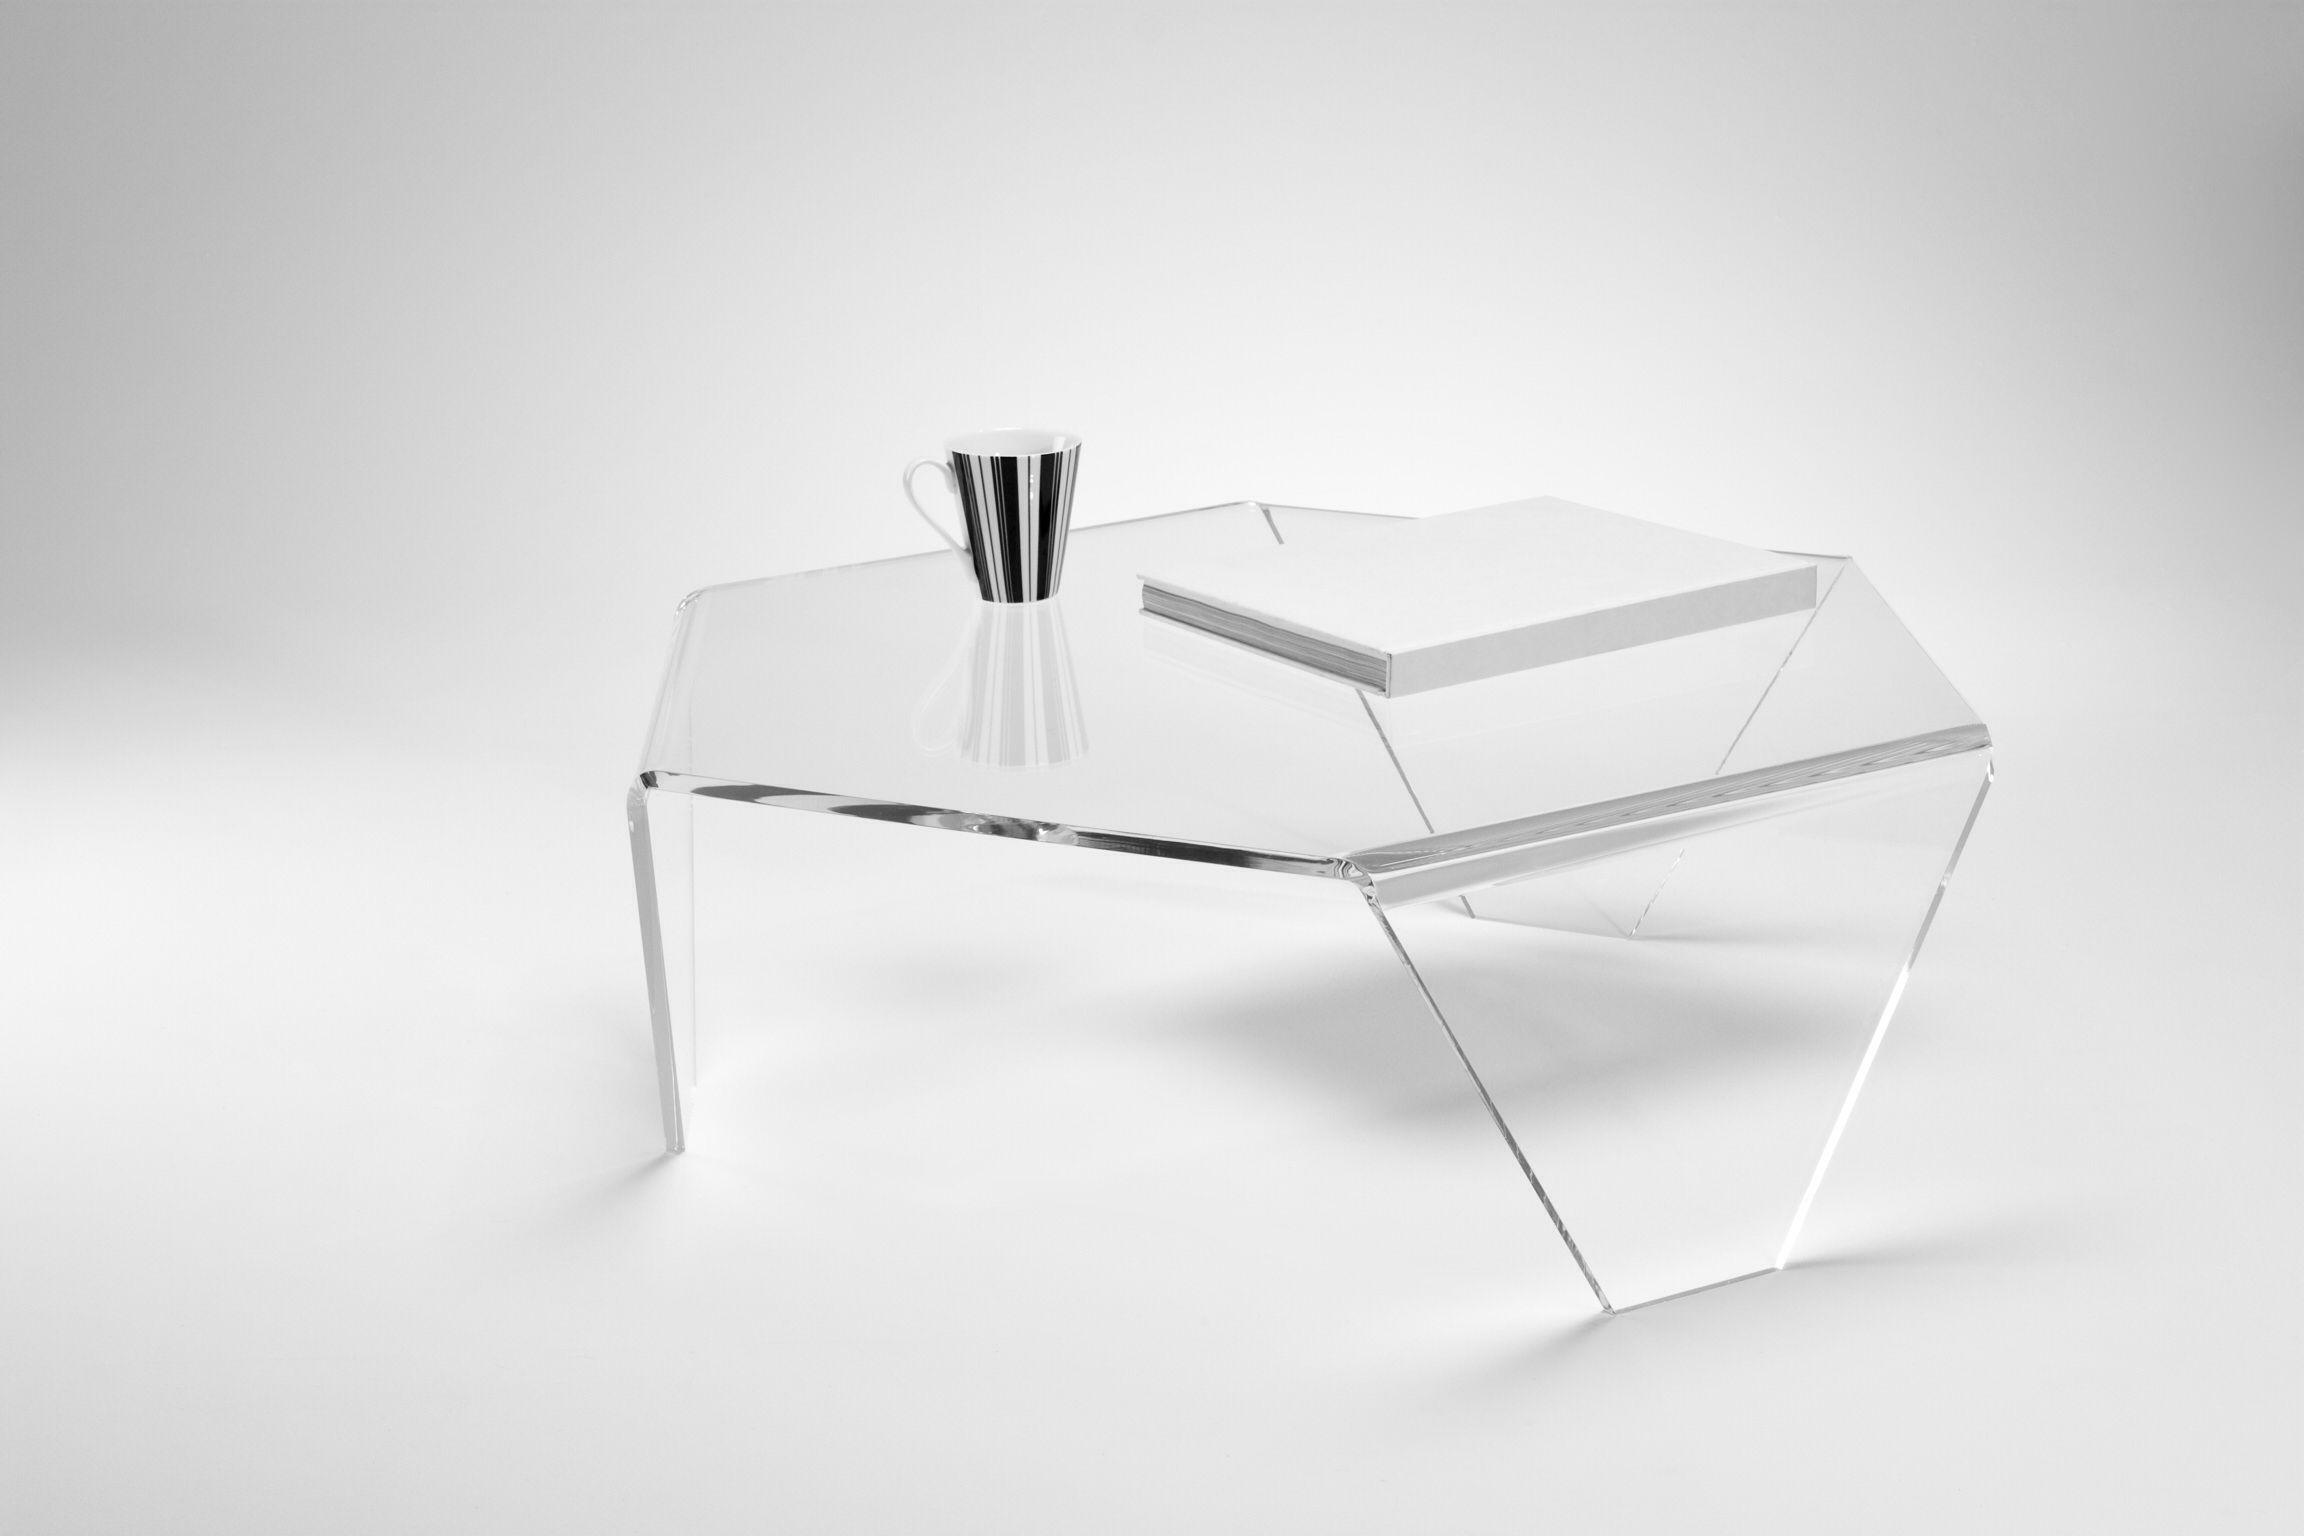 aa2c4c05344da5fdea664d1ce5e9eca8 Incroyable De Table Basse Plexi Des Idées